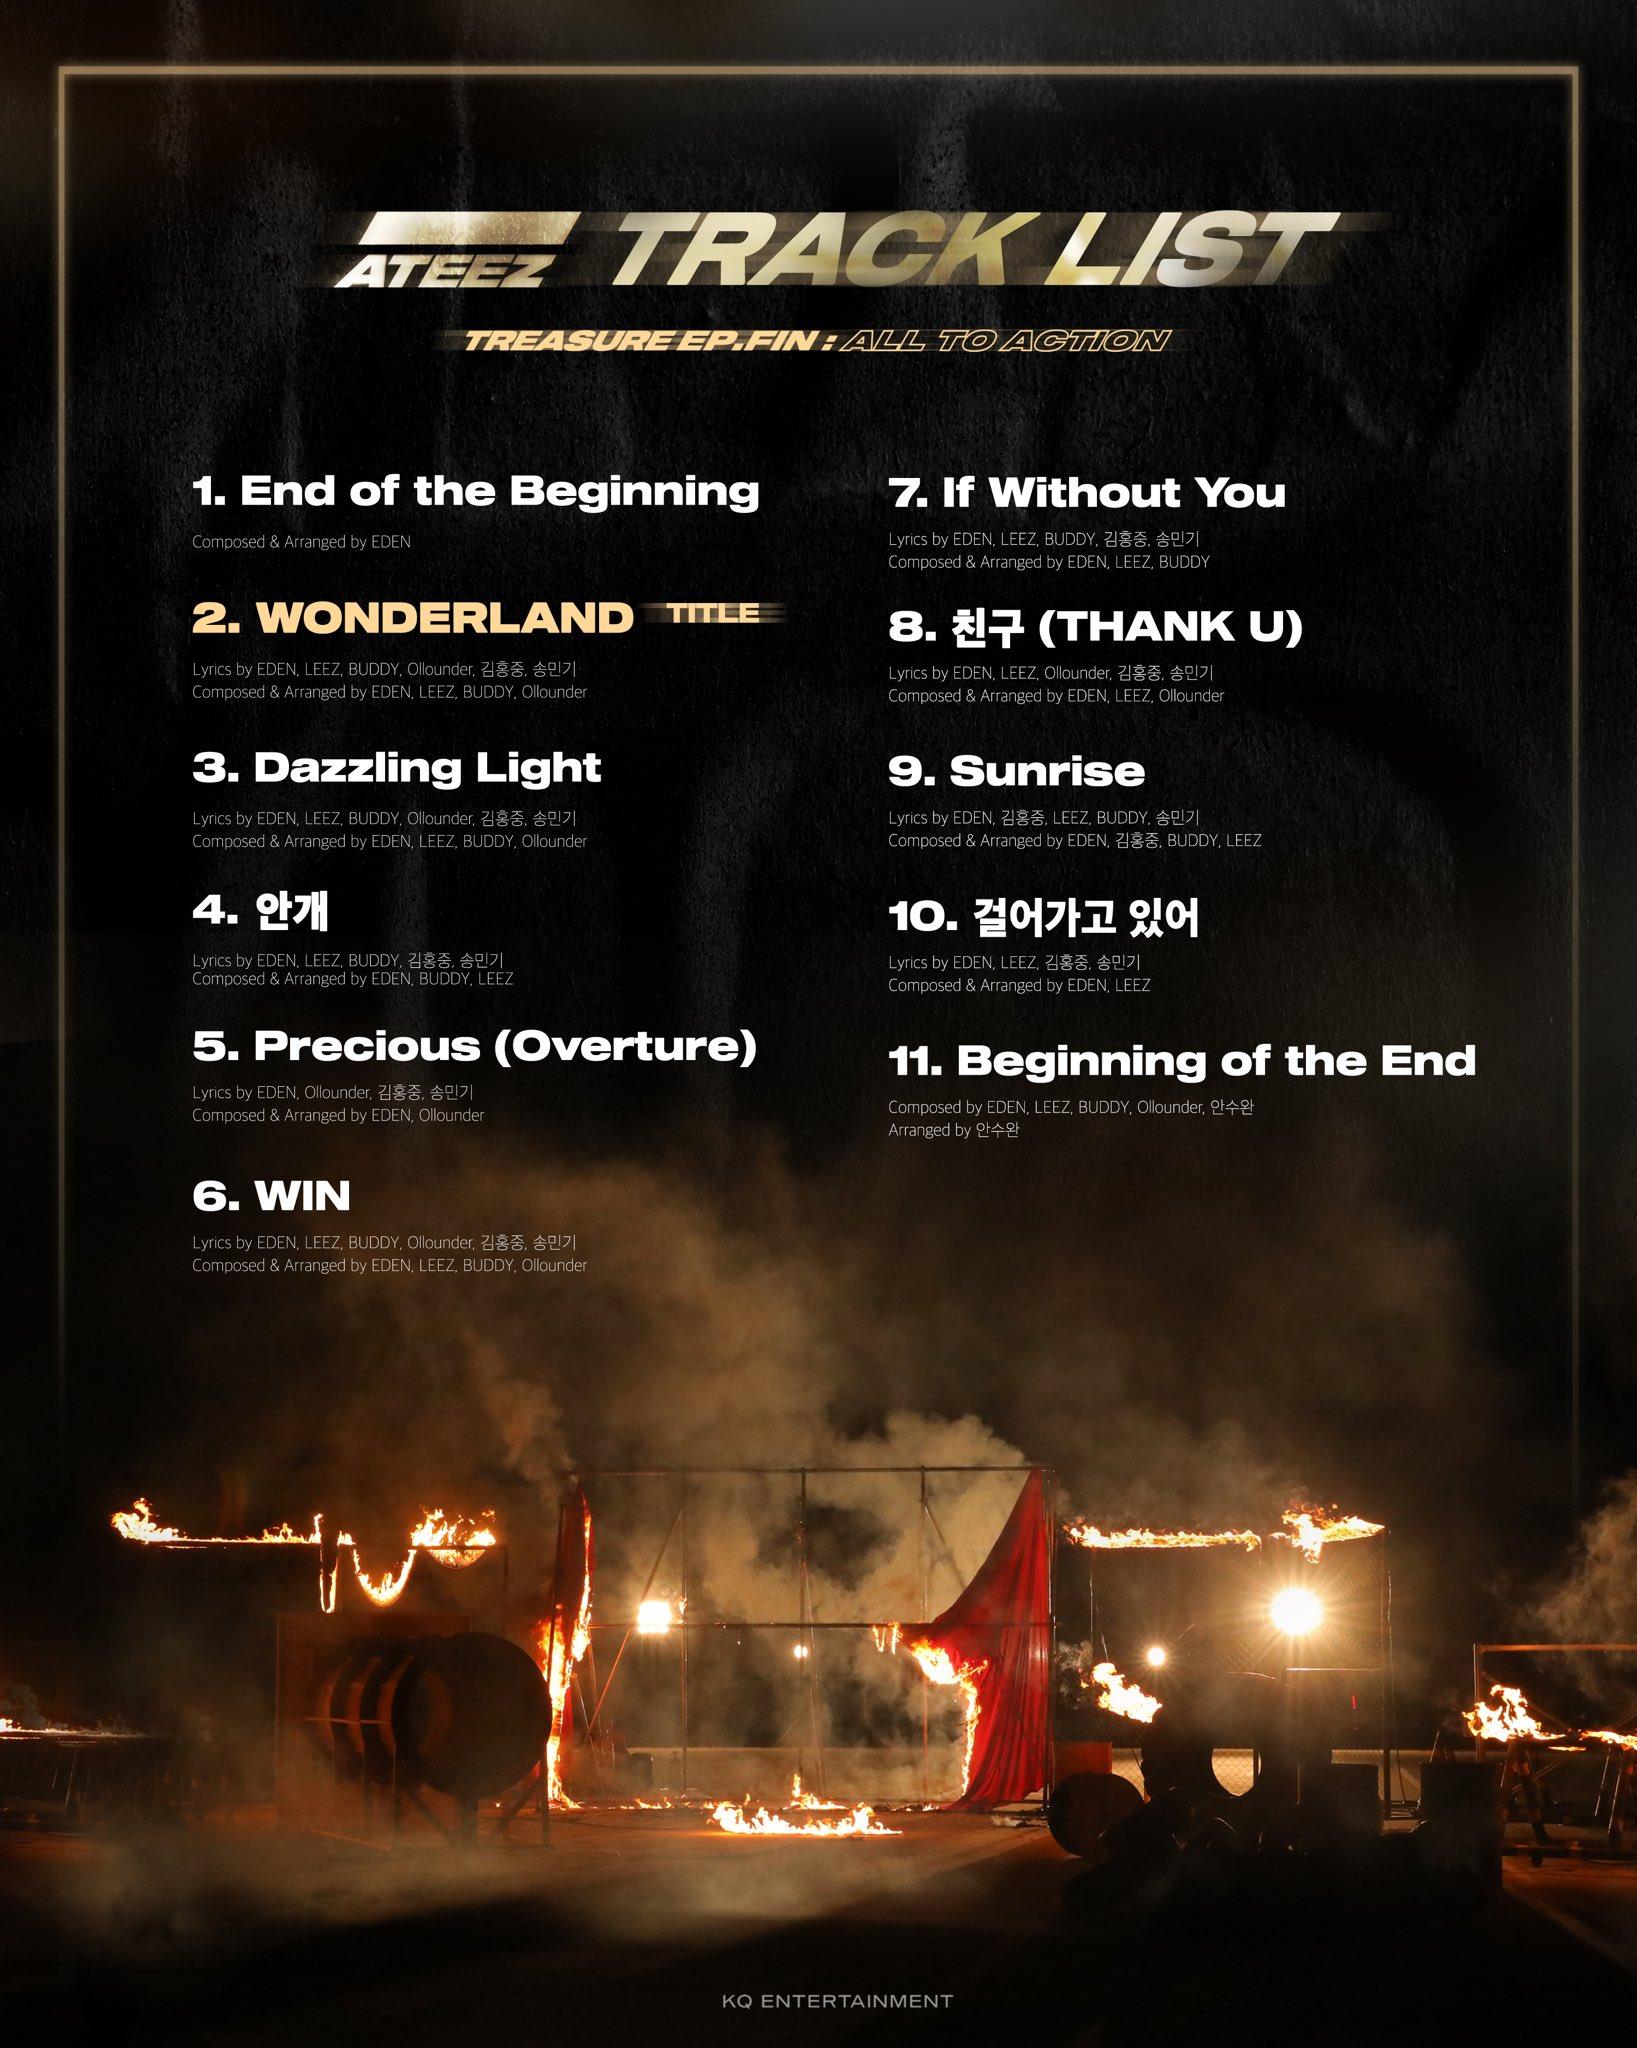 Ateez track list